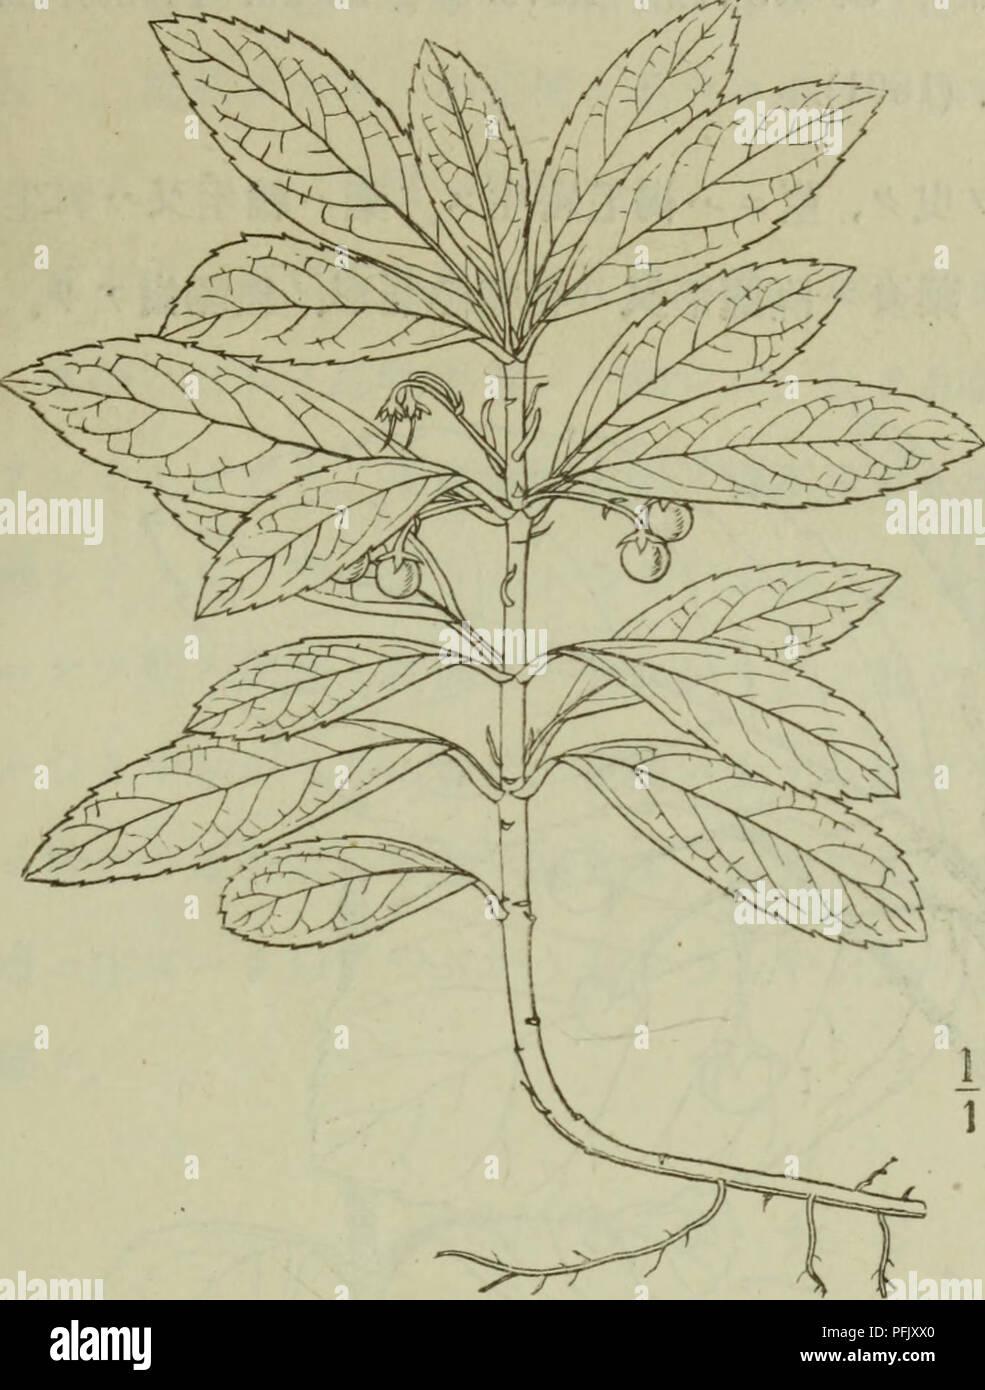 Dai Nihon Jumokushi Trees Shrubs C E C C 3 A A Aªa Lindleyae A A A Aº A A C Ae A A Ae E aa A A A C A A A A Aeac C A A E Sa A Aªa A A avar Angusta Akai C C A Ai º C C A I A ac C C